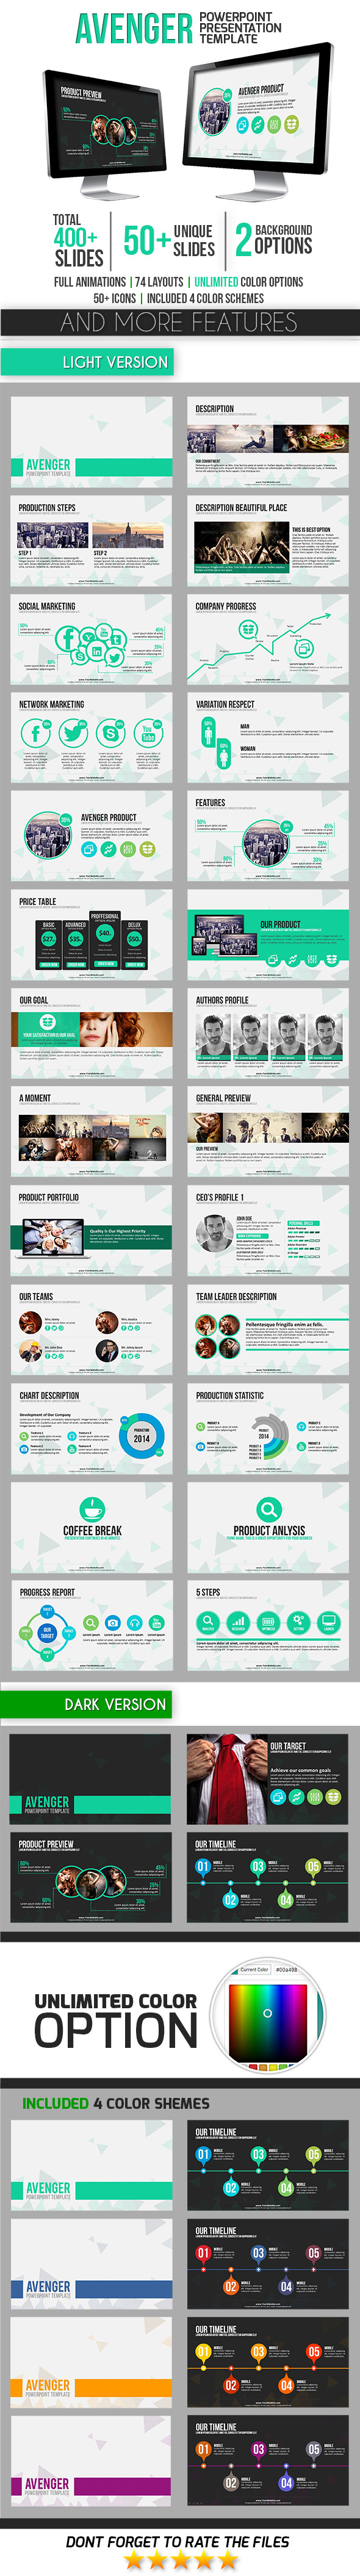 Avenger PowerPoint Template - Business PowerPoint Templates